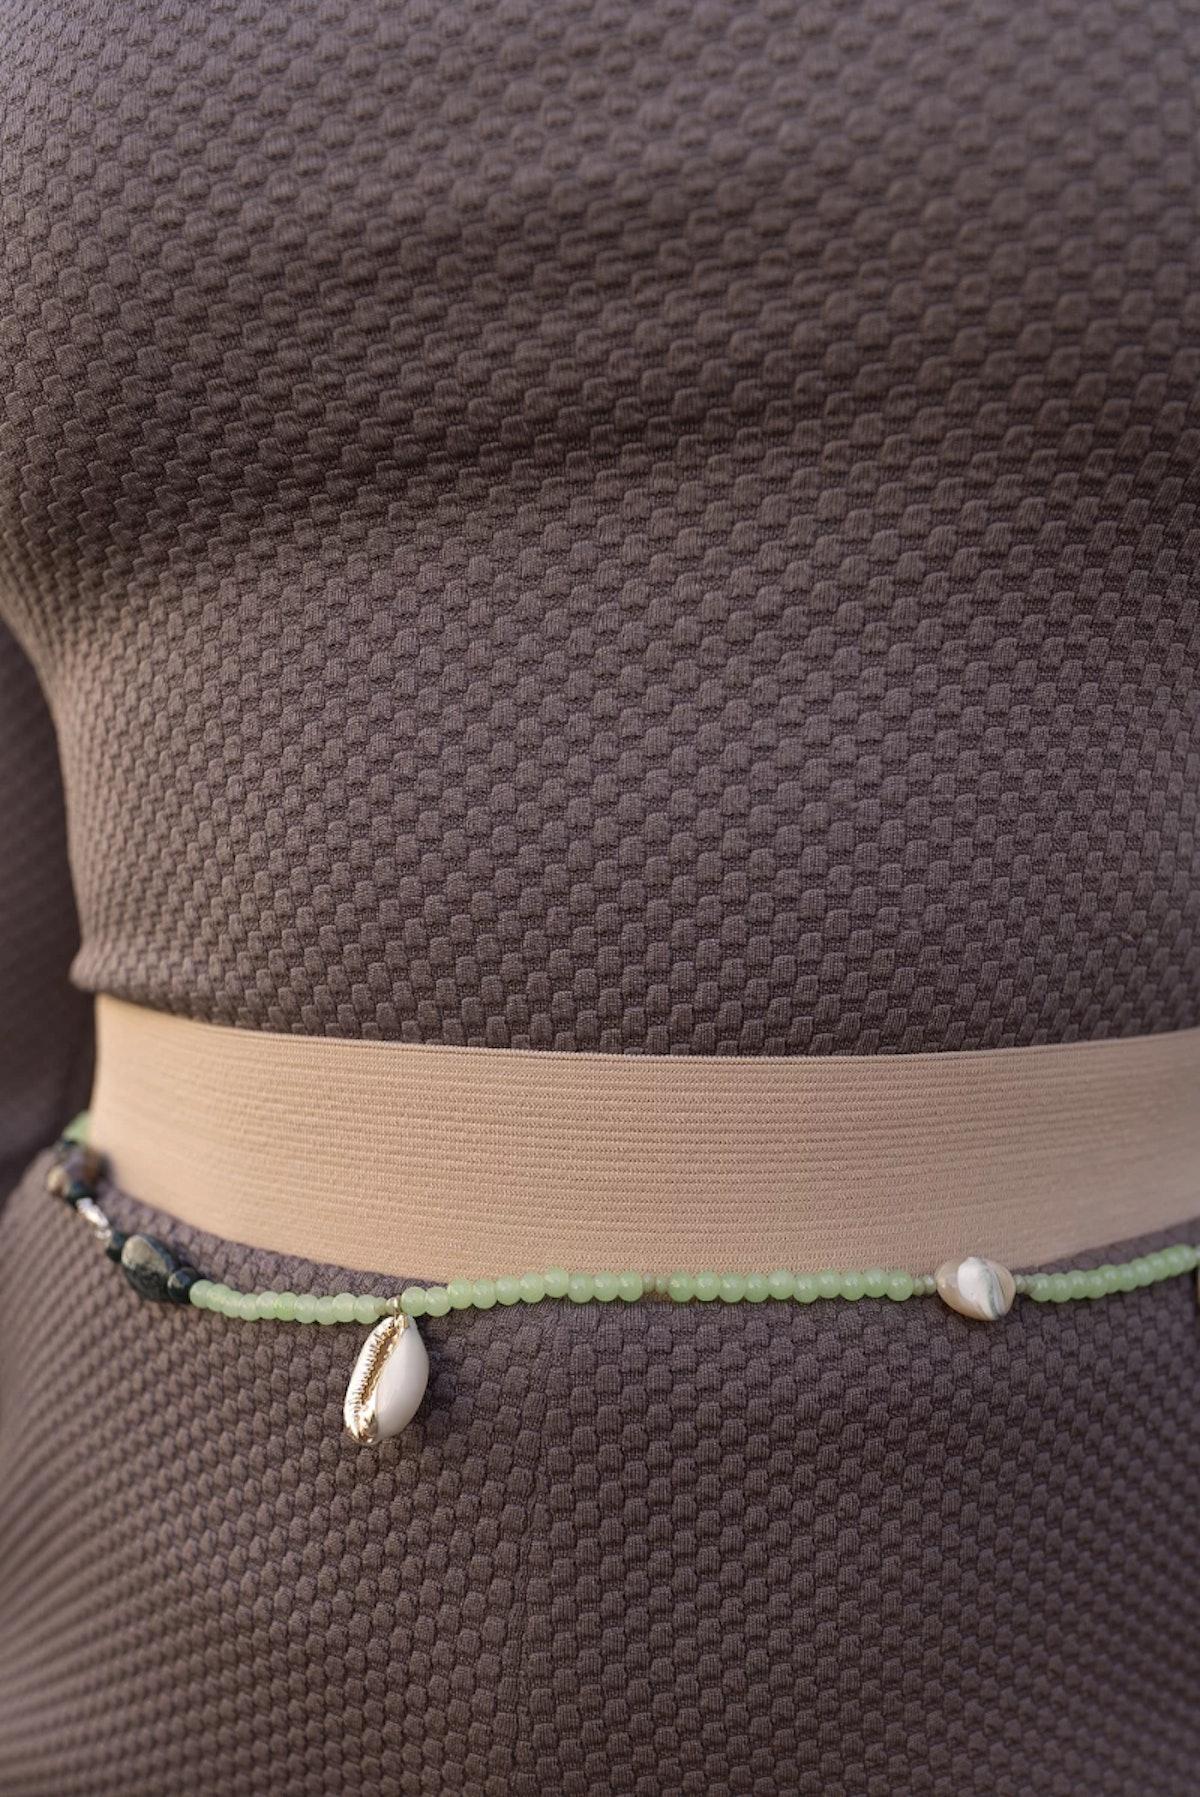 GUERASFATIM's beaded Theobabinbin belt.